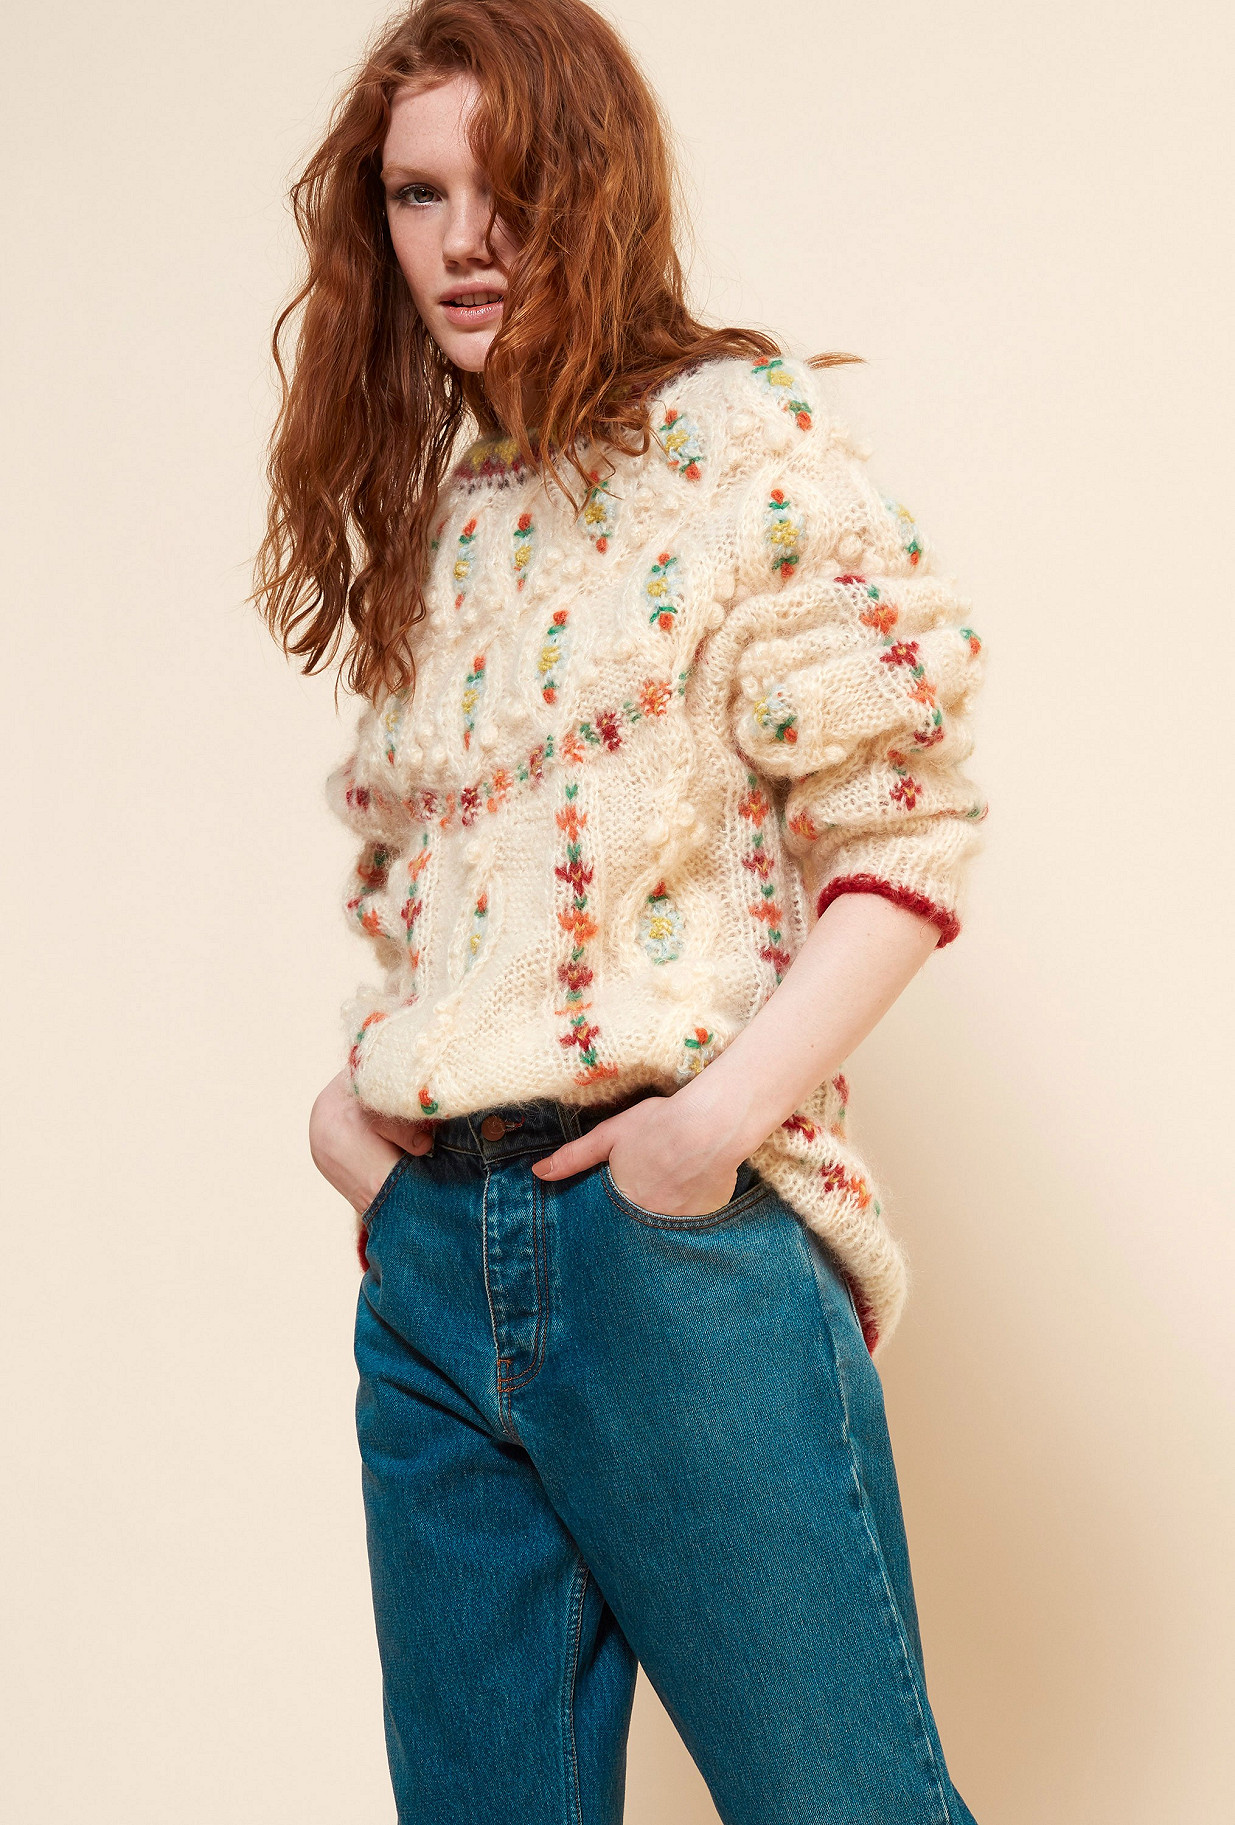 clothes store Knit  Cheerleader french designer fashion Paris